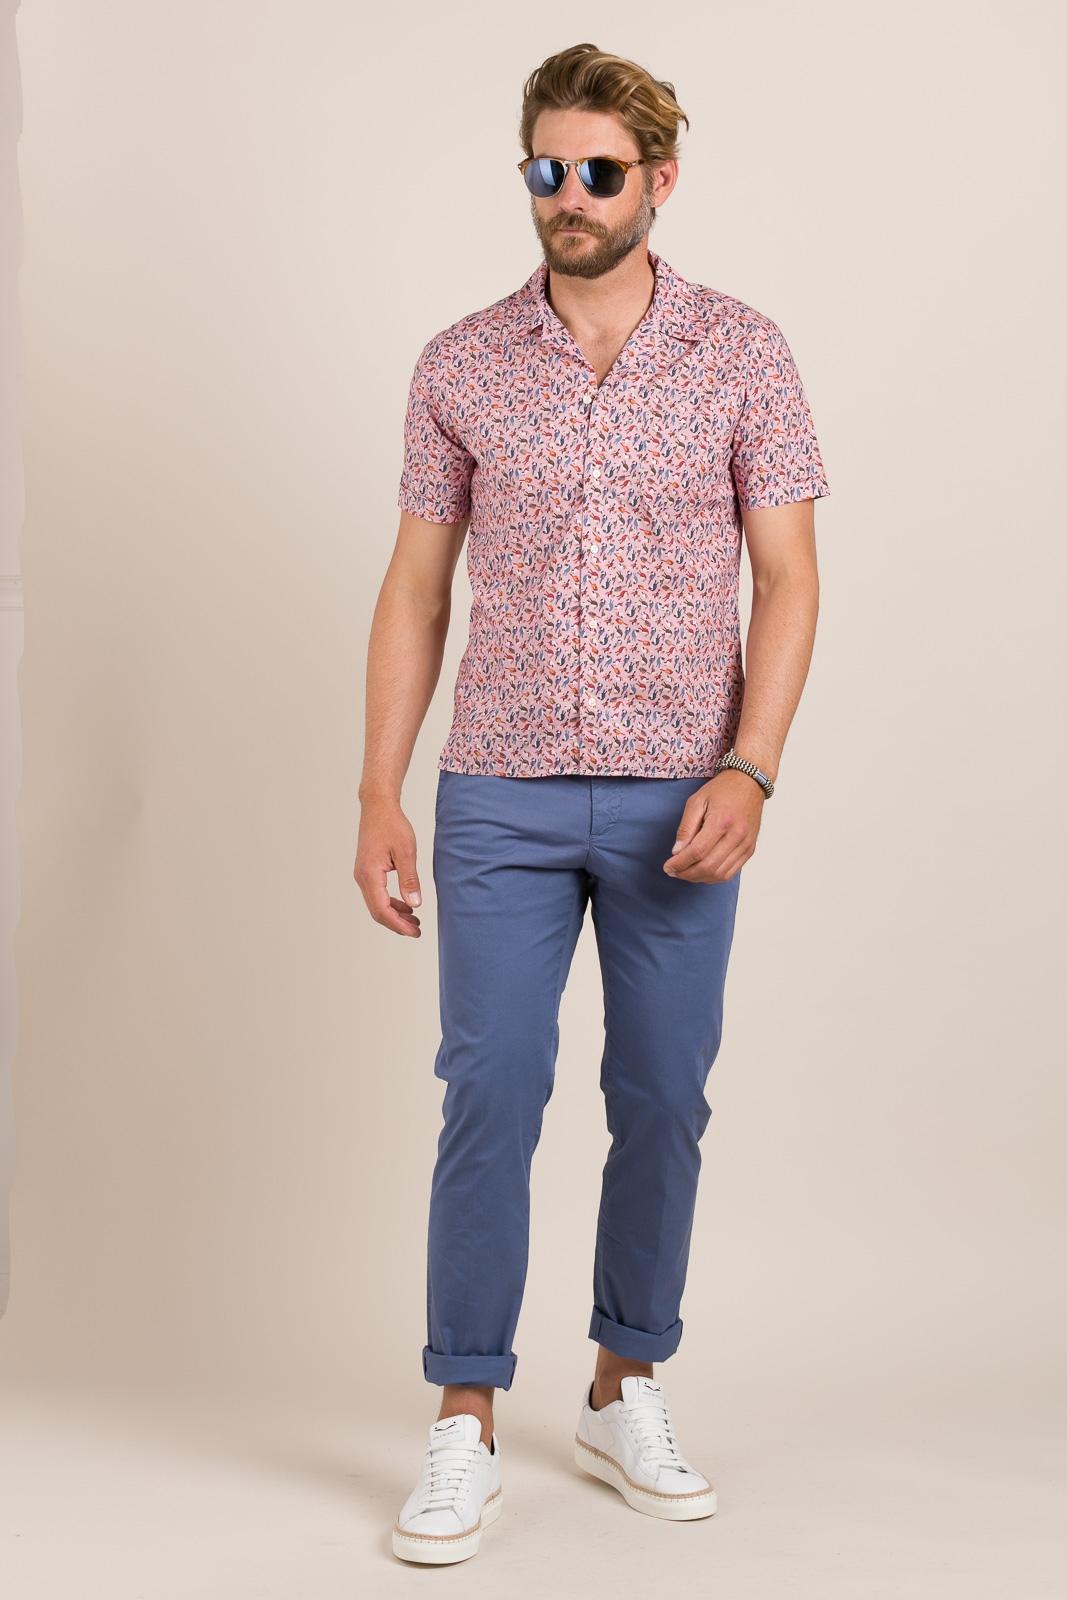 Camisa sport FUREST COLECCIÓN modelo HAWAI rosa - Ítem3